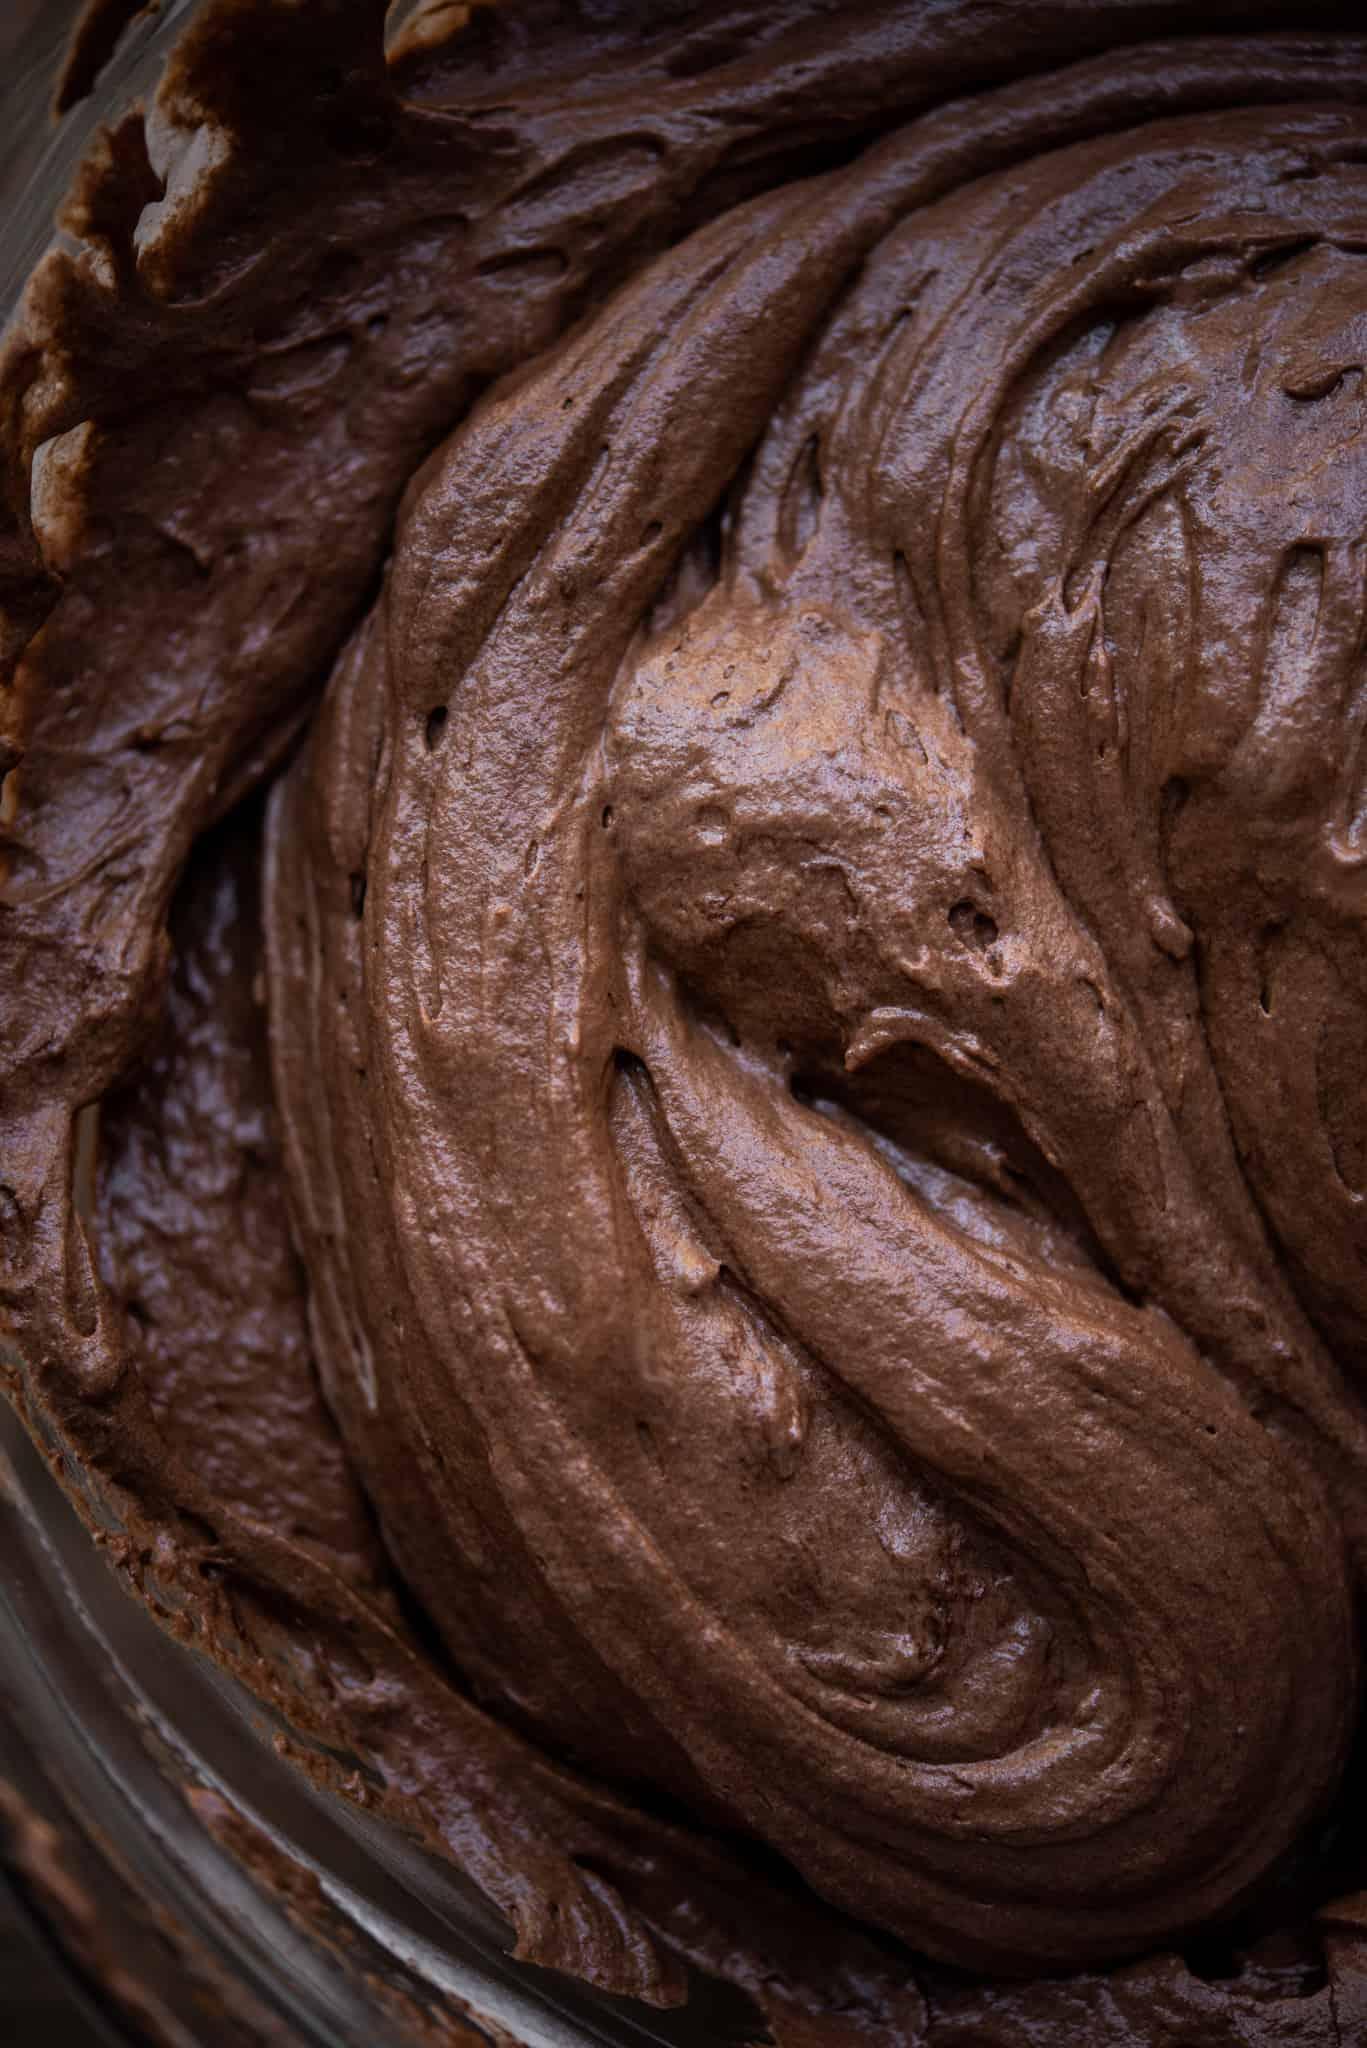 close up view of dark chocolate vegan mousse in bowl